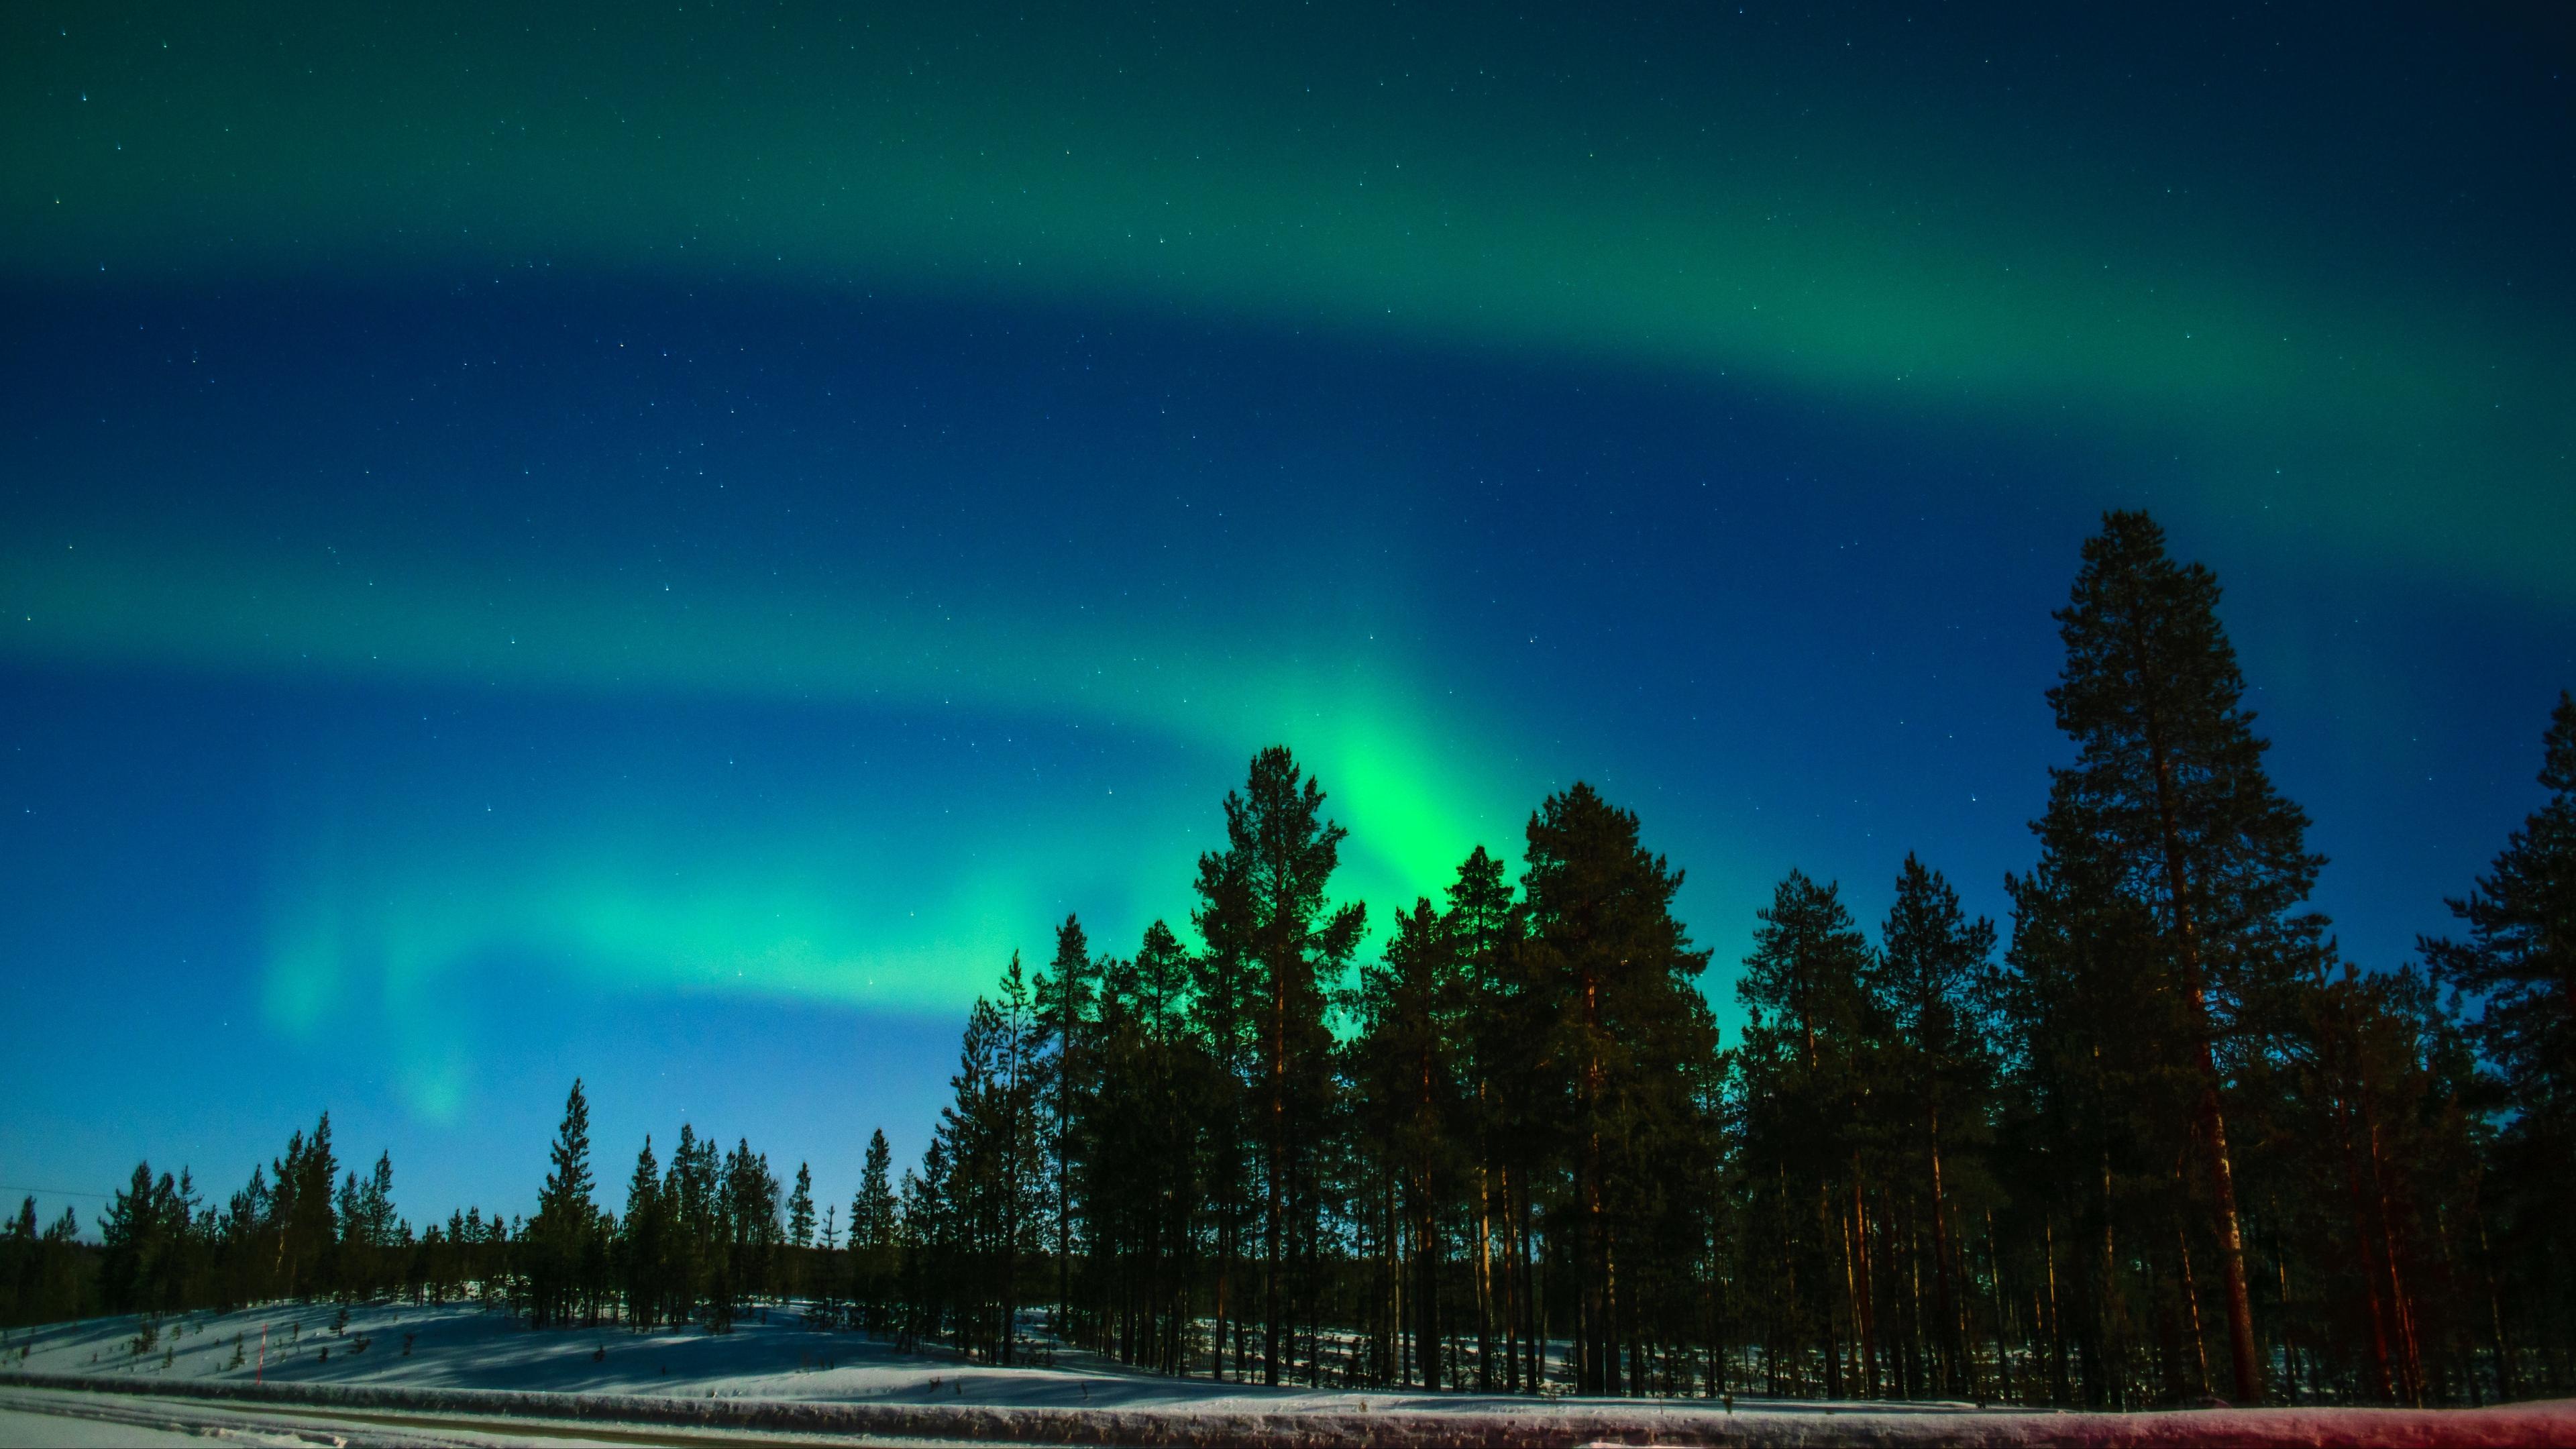 northern lights aurora trees light phenomenon lapland 4k 1541116055 - northern lights, aurora, trees, light phenomenon, lapland 4k - Trees, northern lights, Aurora